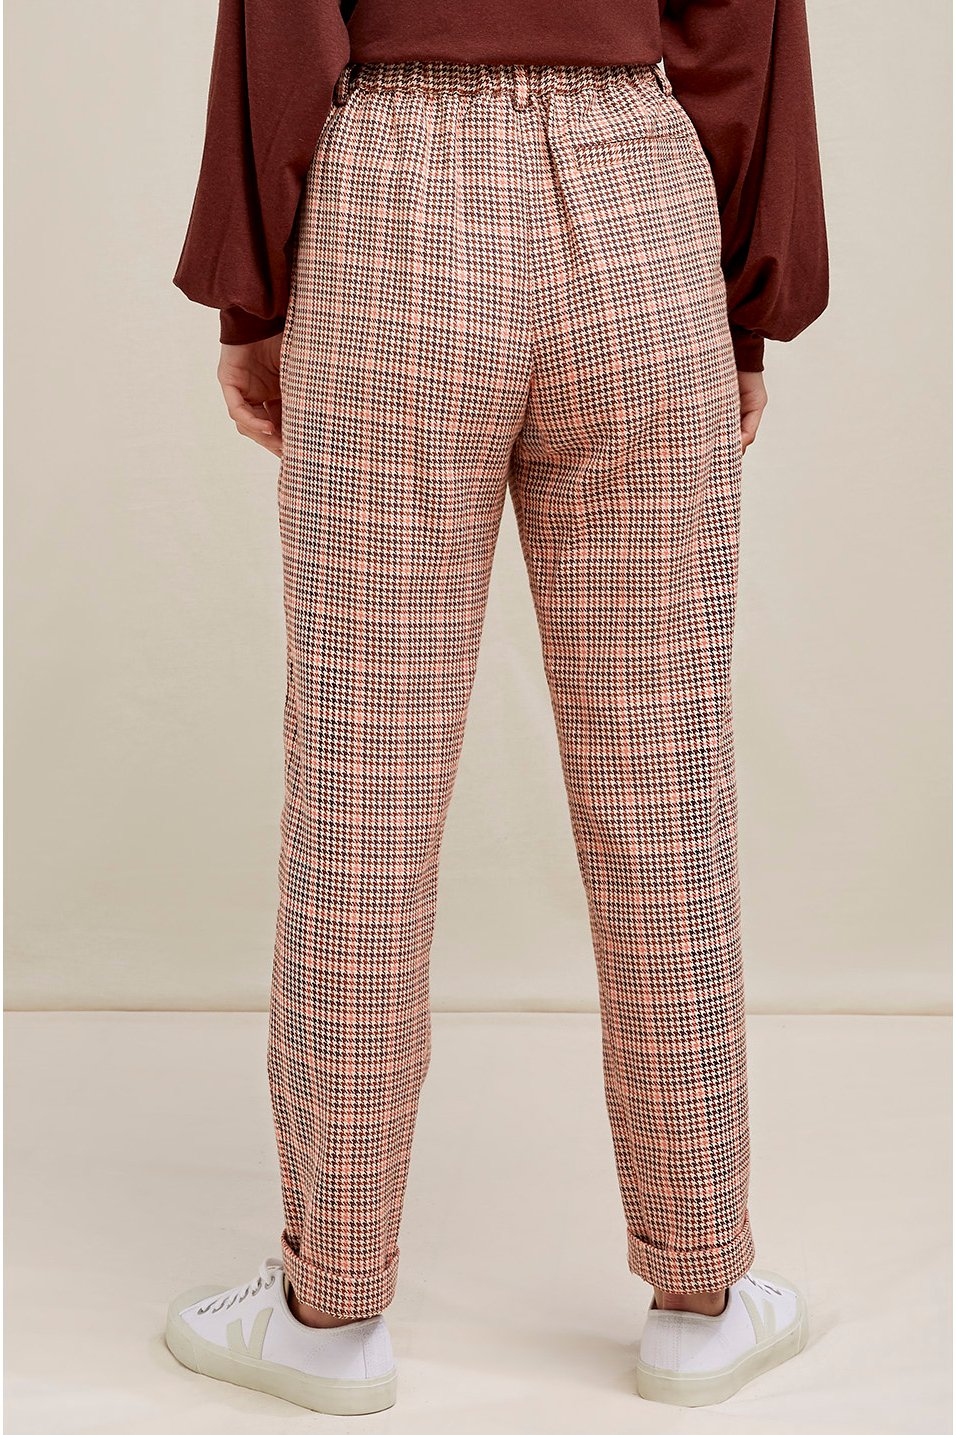 Roberta Organic Fashion Peopletree Hose Annis Houndstooth 4